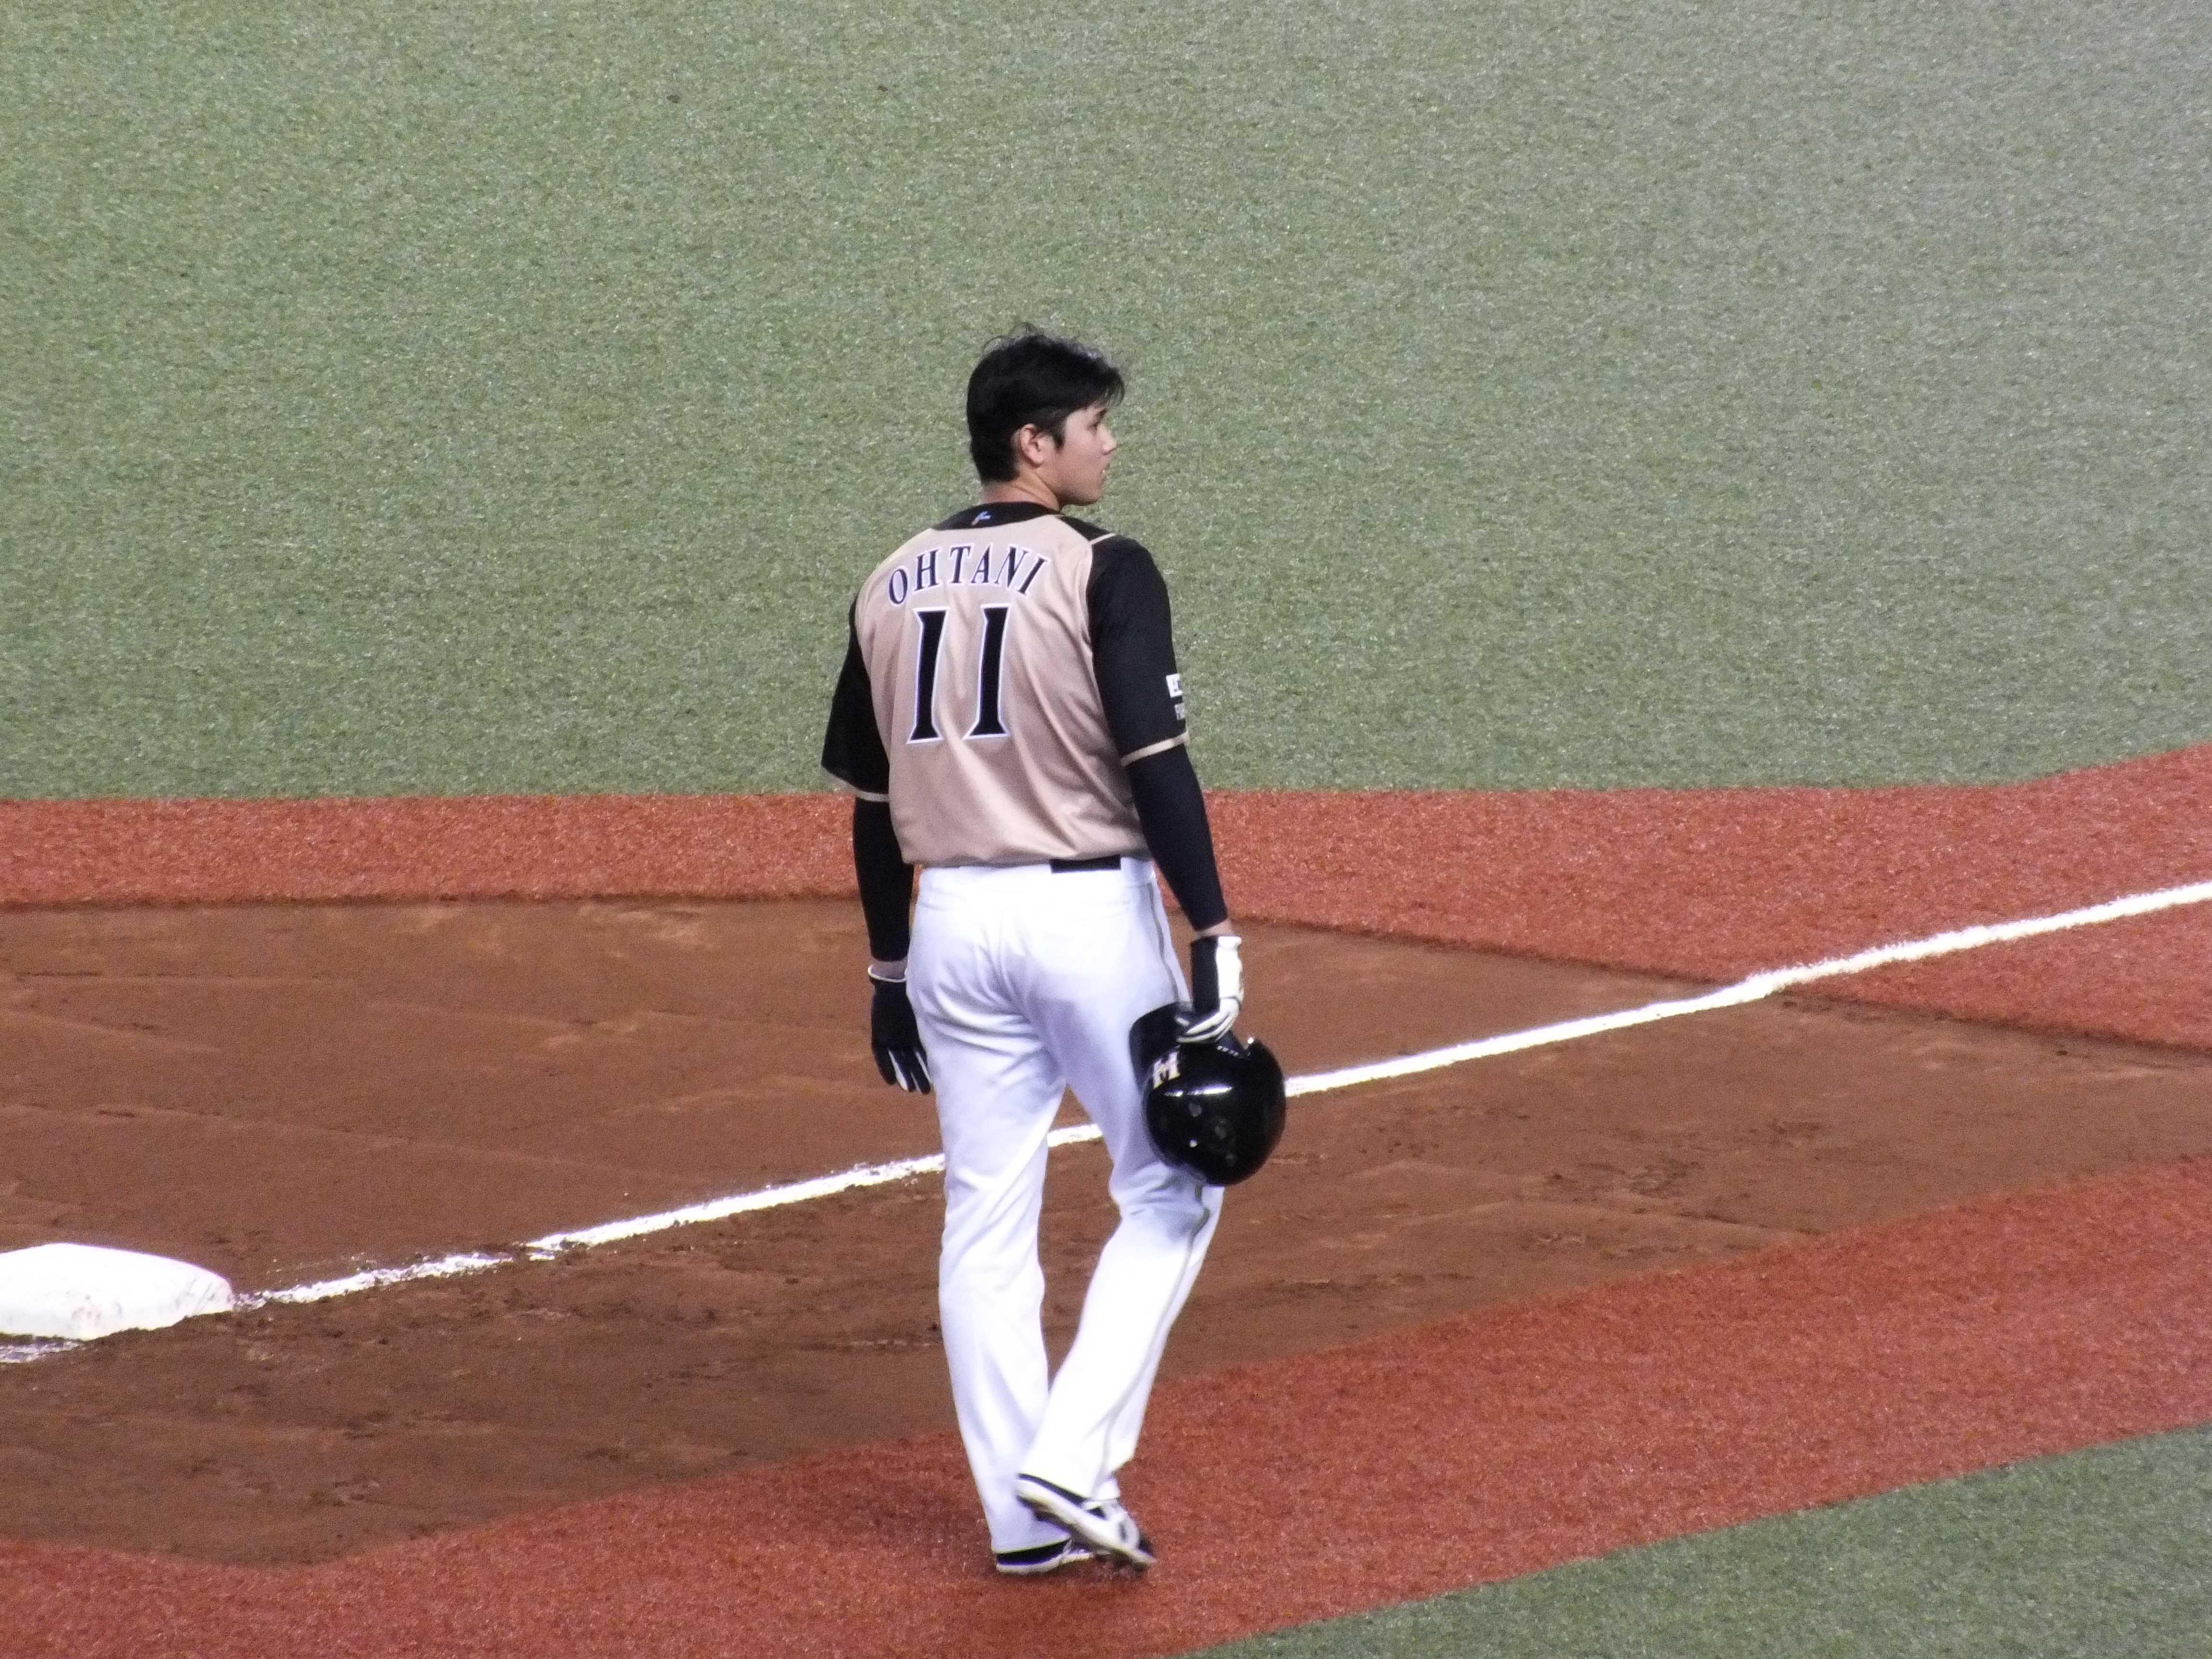 OHTANI 11 (大谷翔平 背番号11)